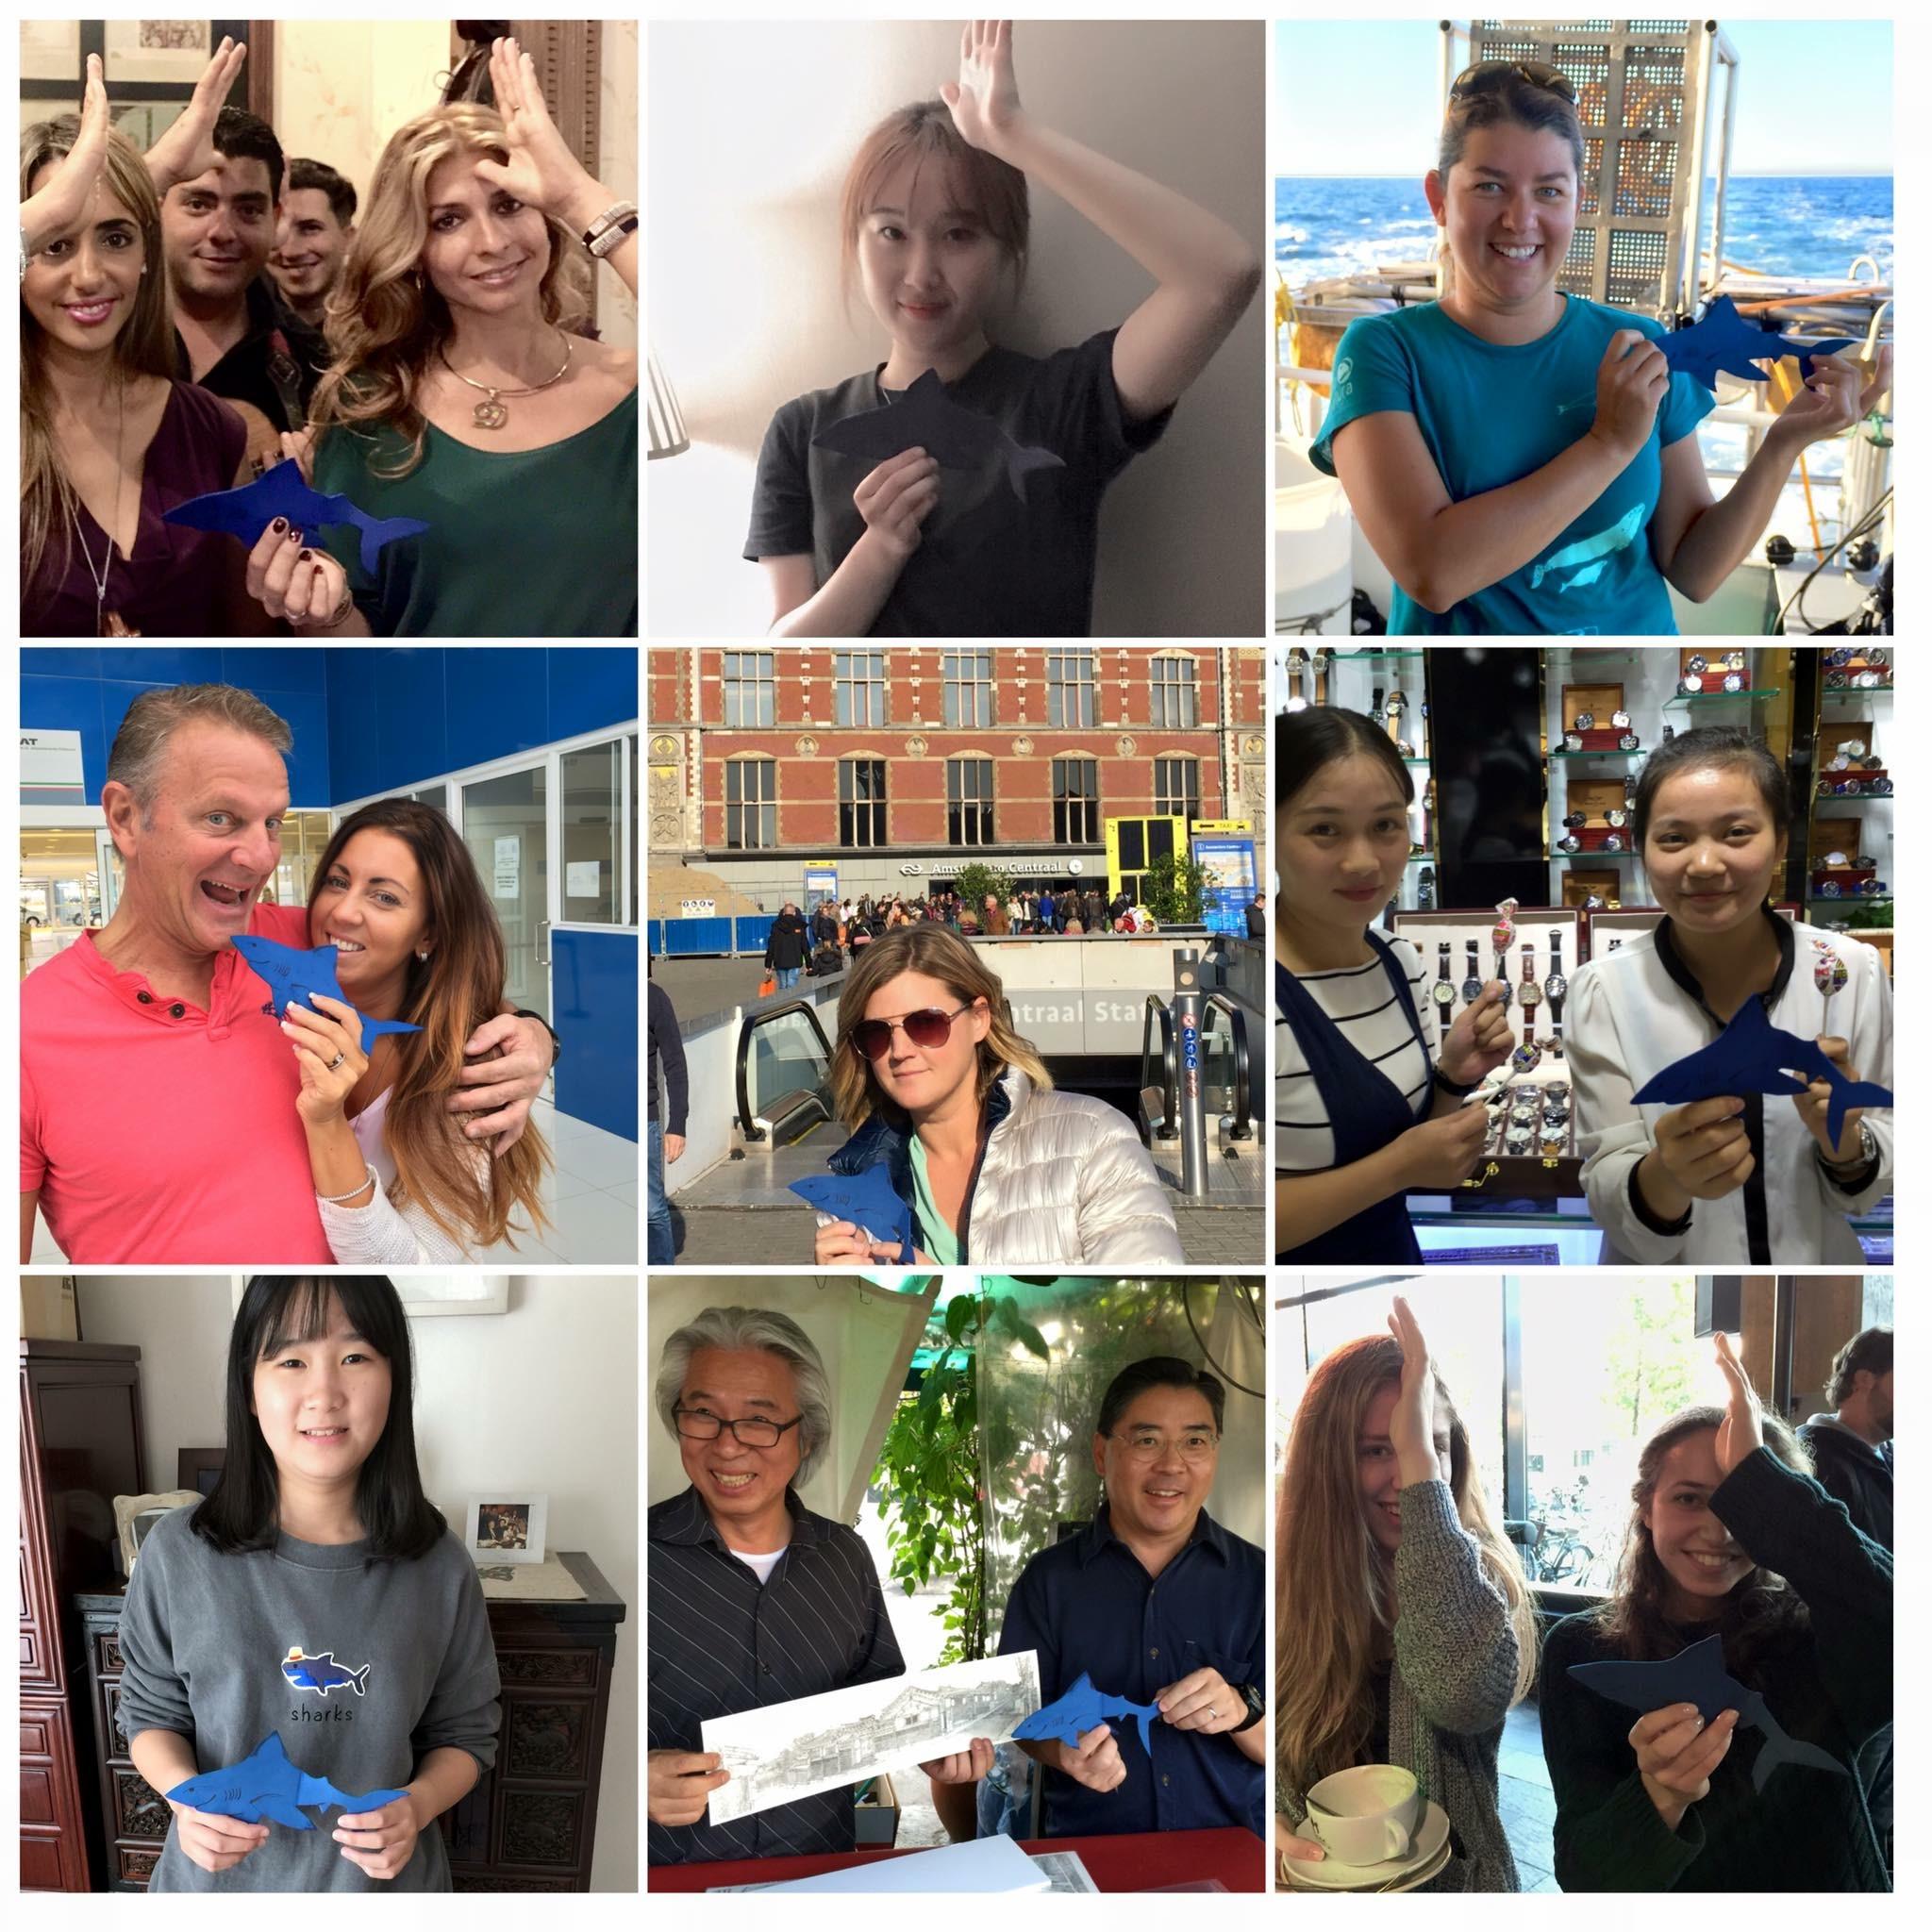 SpenceTheShark in Korea, Amsterdam, Mexico, Cuba and China